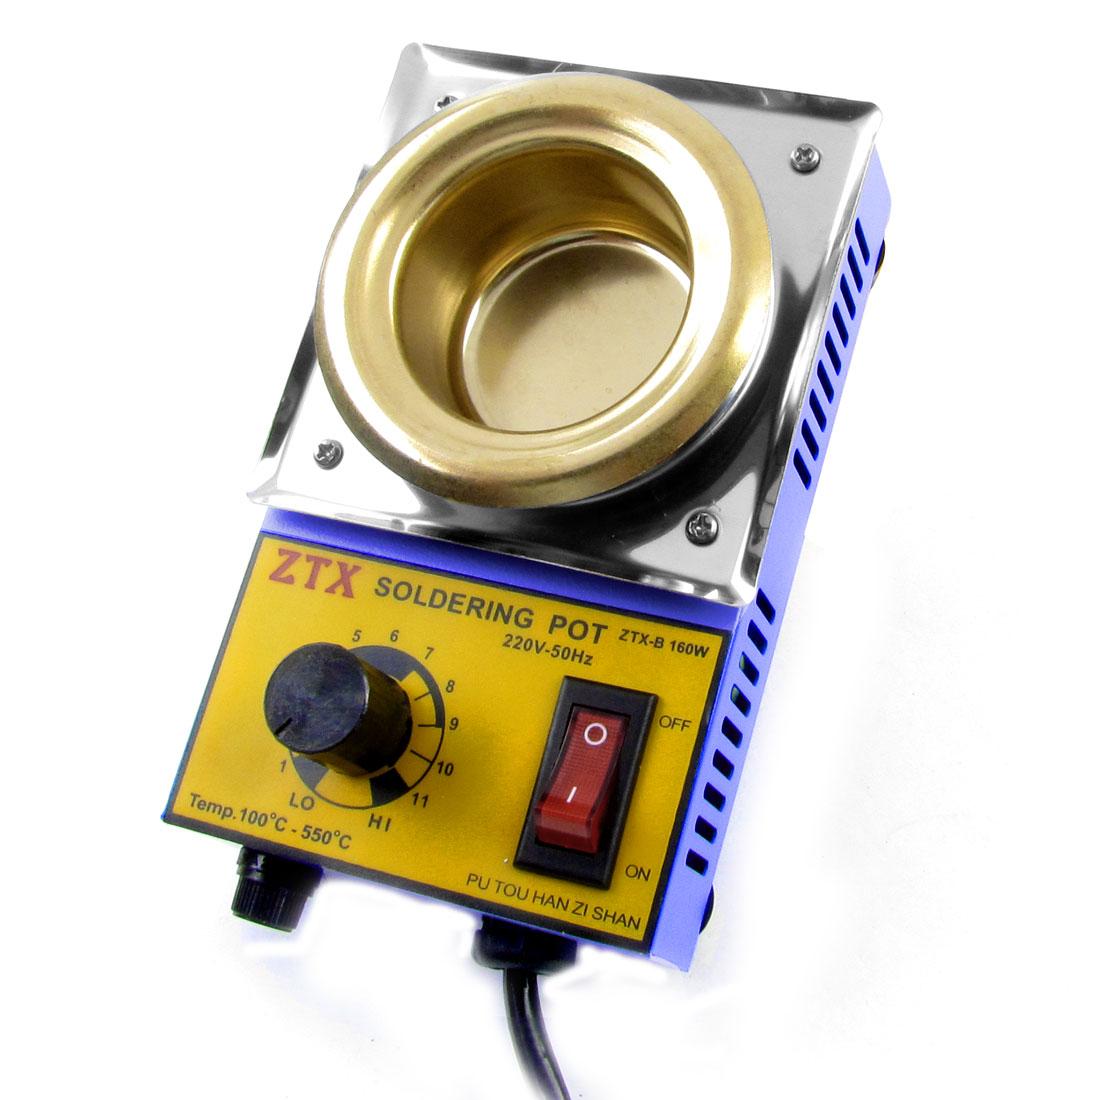 AU Plug AC 220V 160W Round Solder Pot Soldering Desoldering Bath